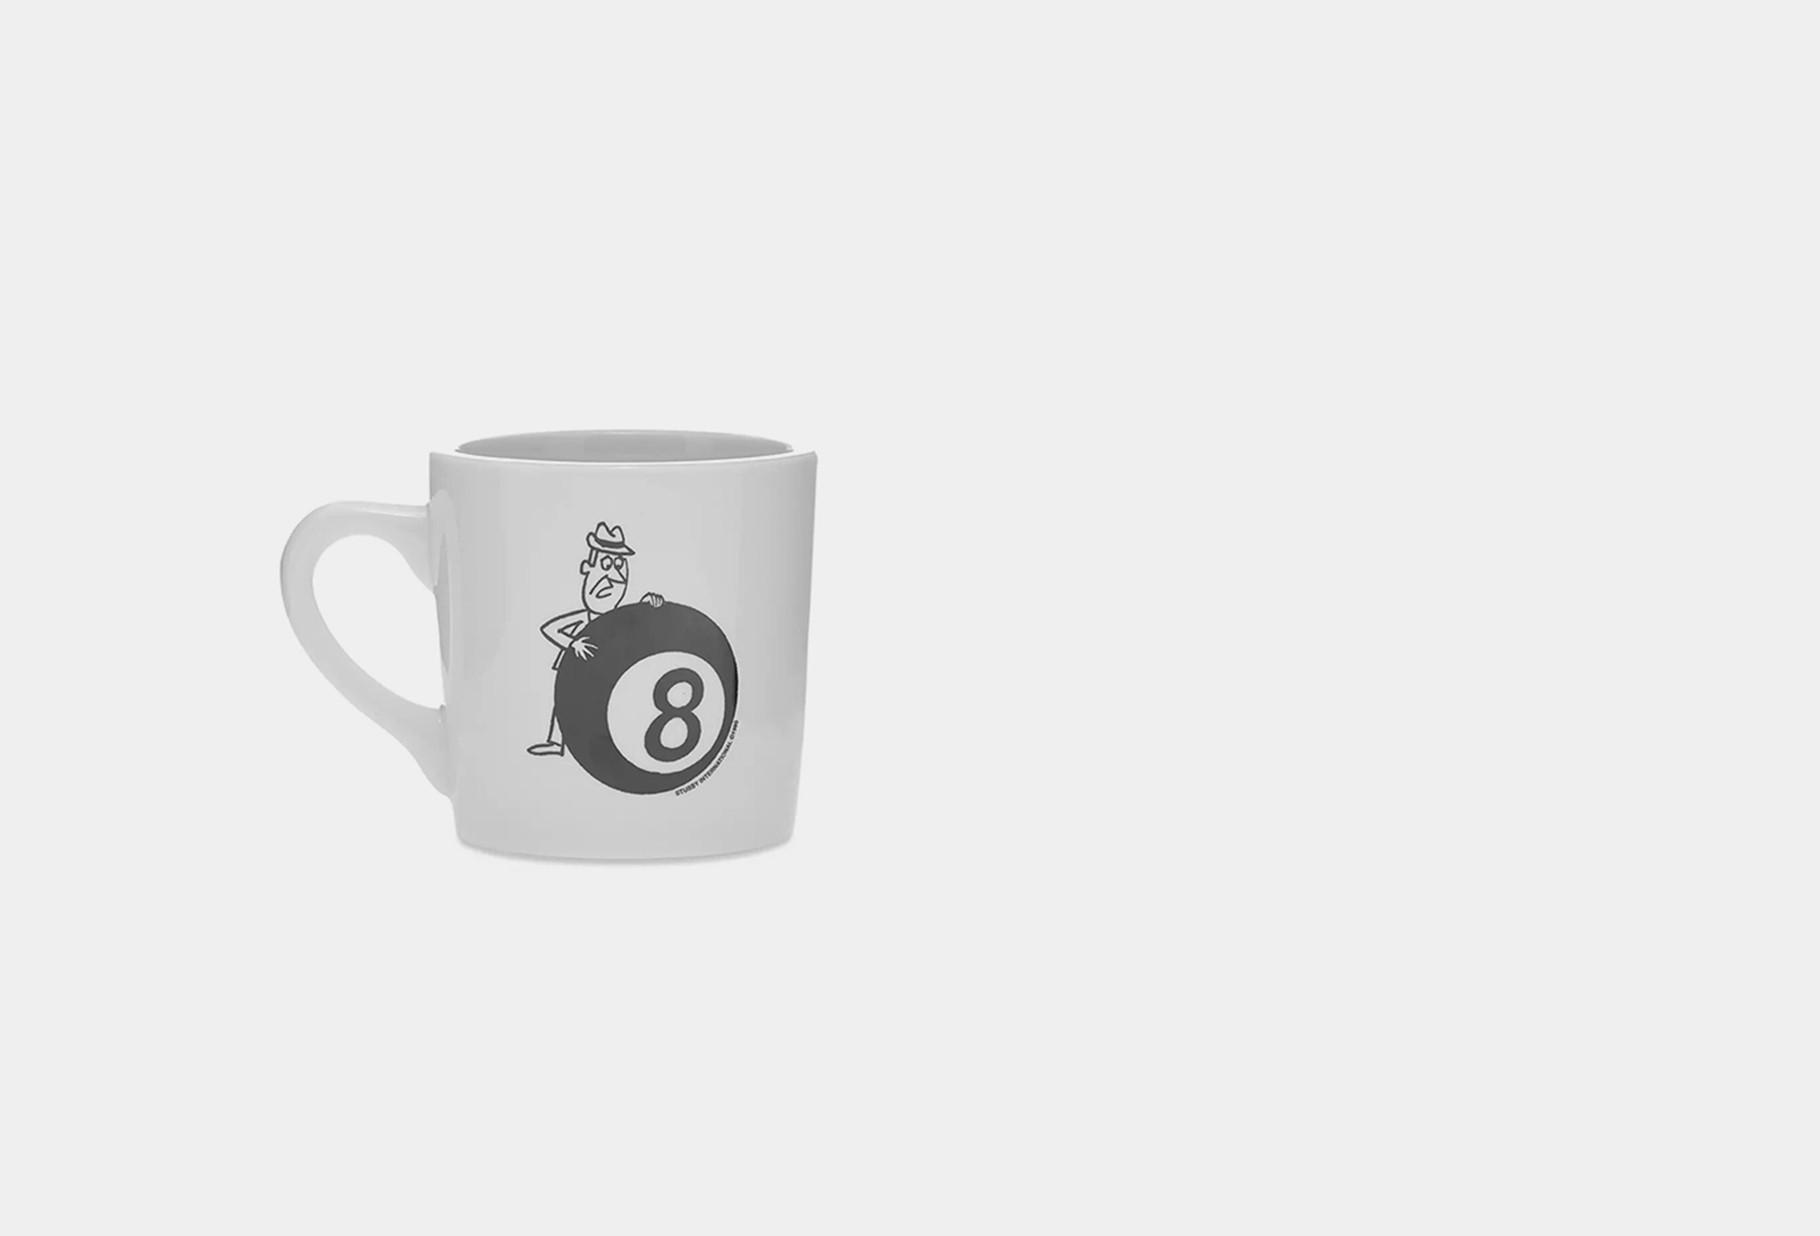 STUSSY / Behind the 8 ball ceramic mug White